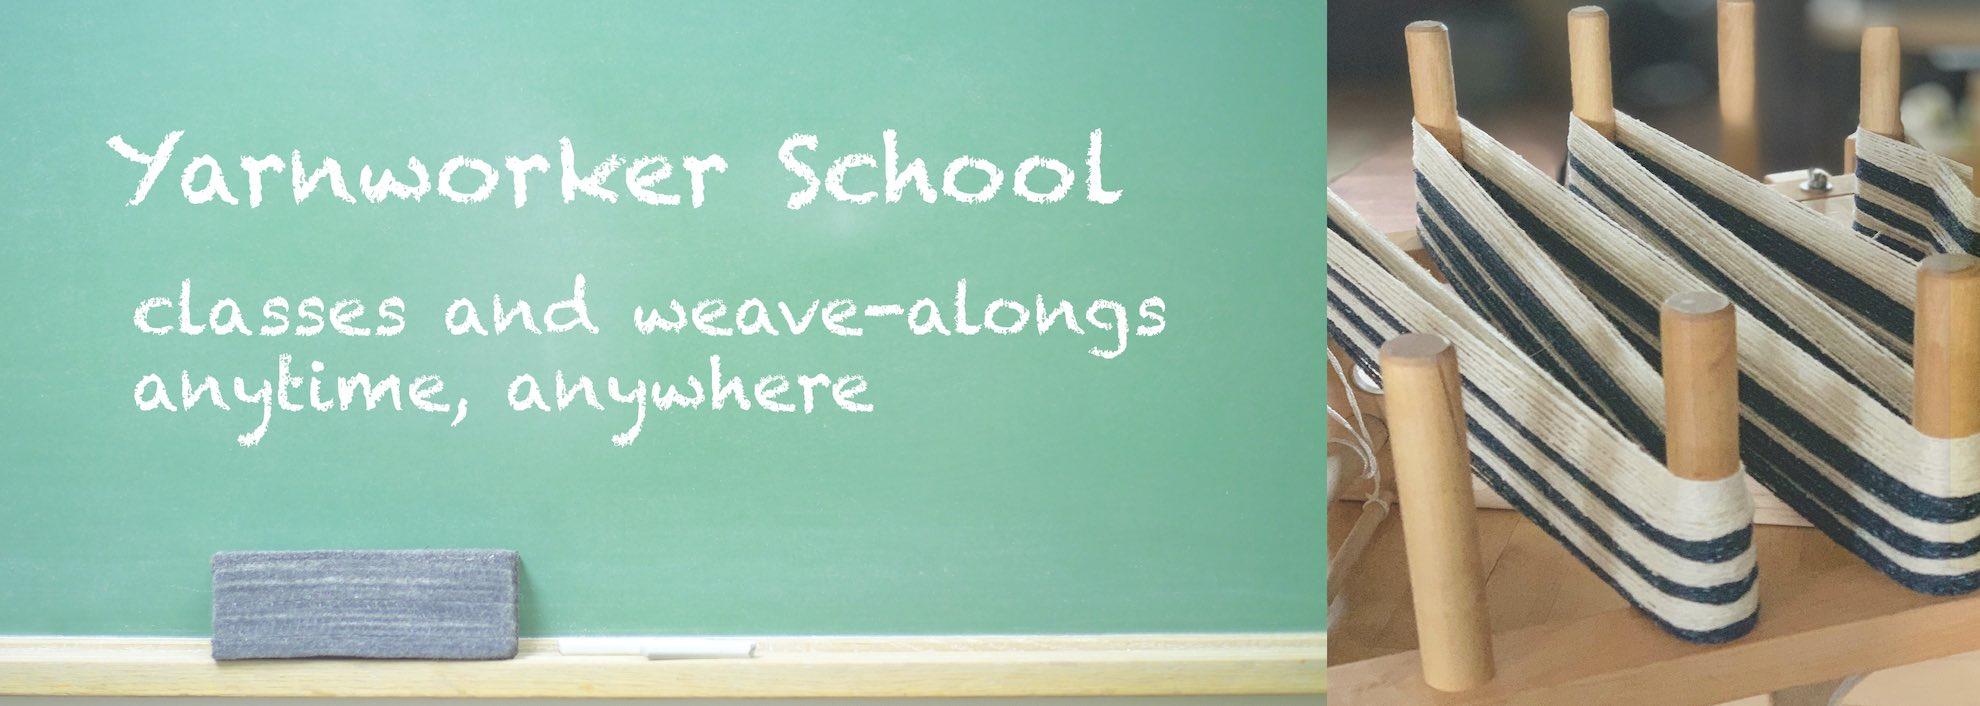 Yarnworker-School